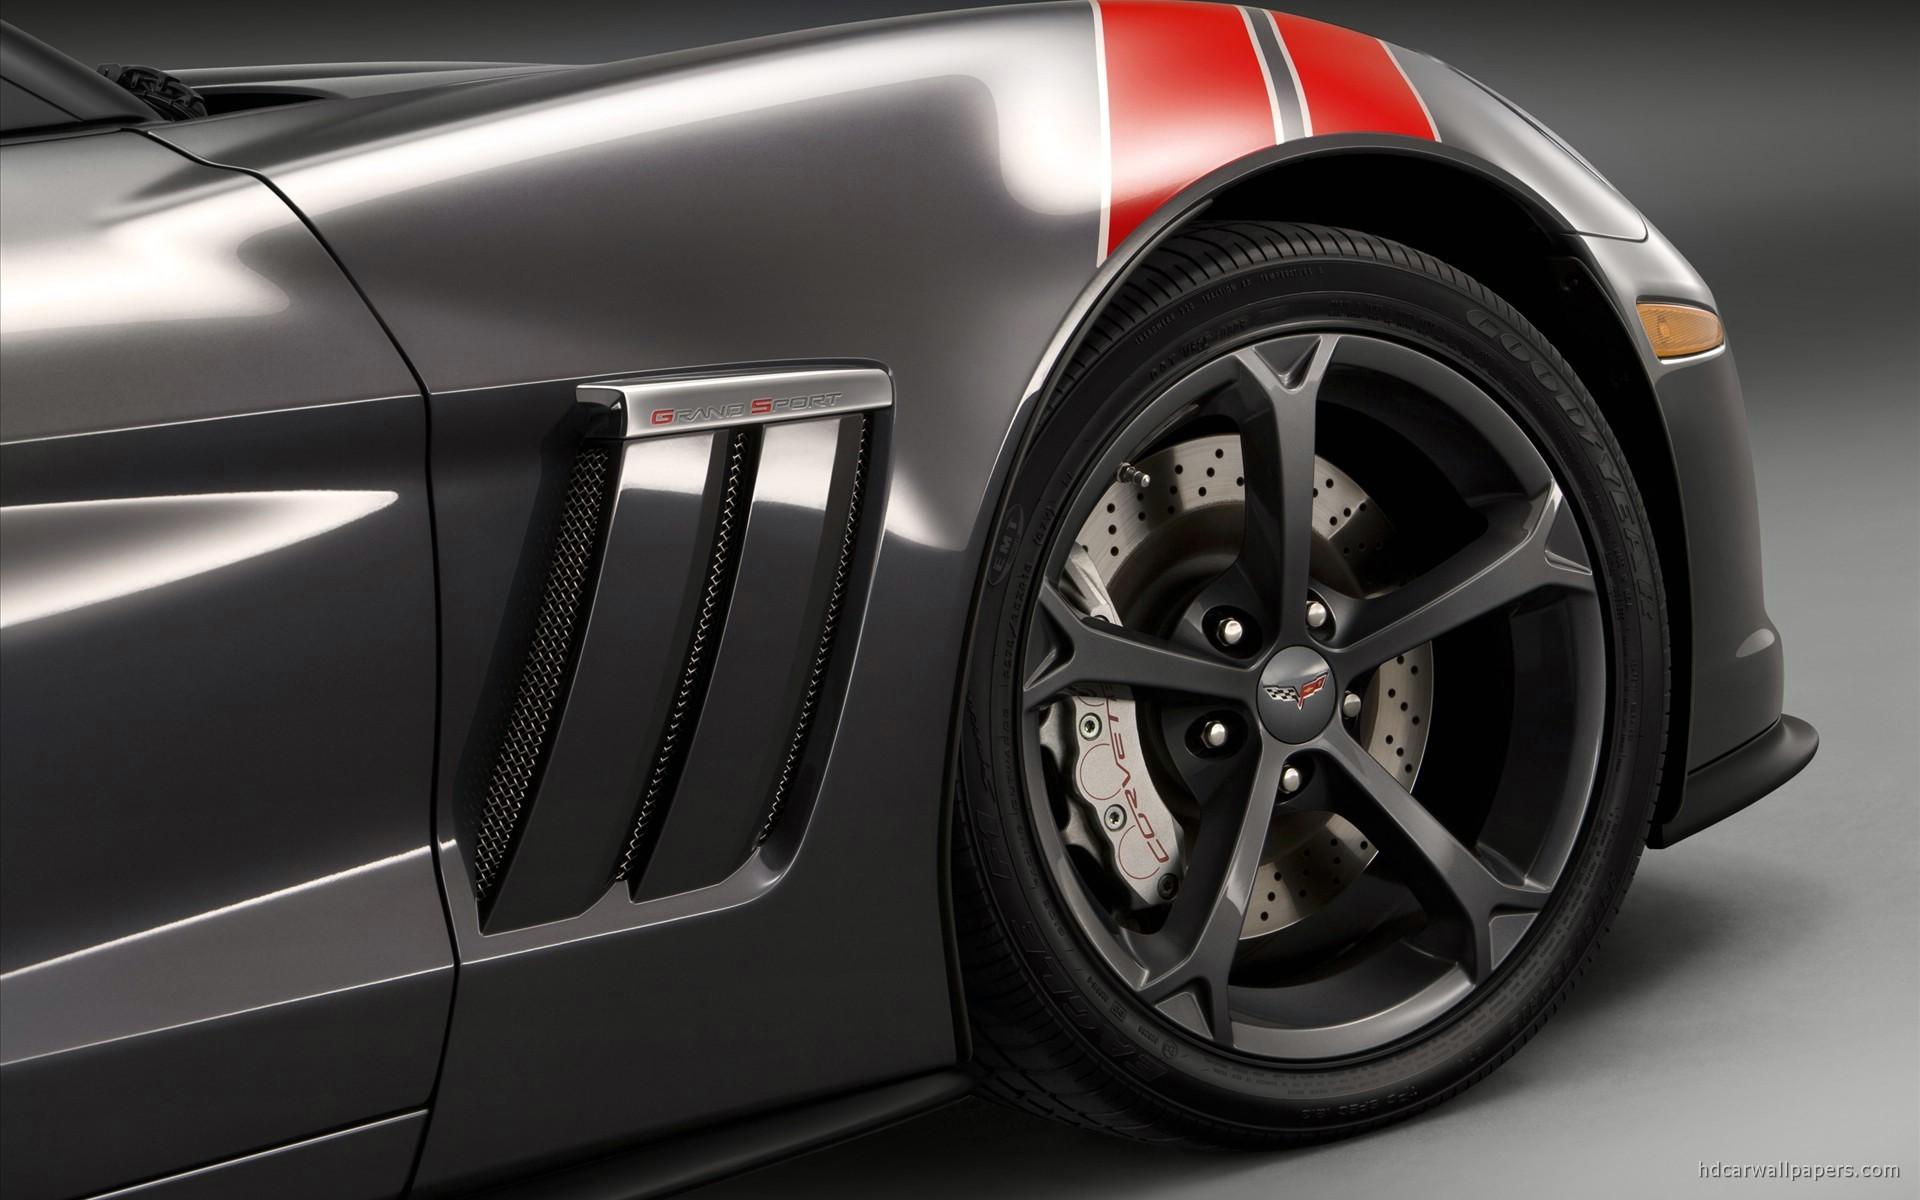 Corvette Grand Sport Iphone Wallpaper: Chevrolet Corvette Grand Sport Heritage 2 Wallpaper